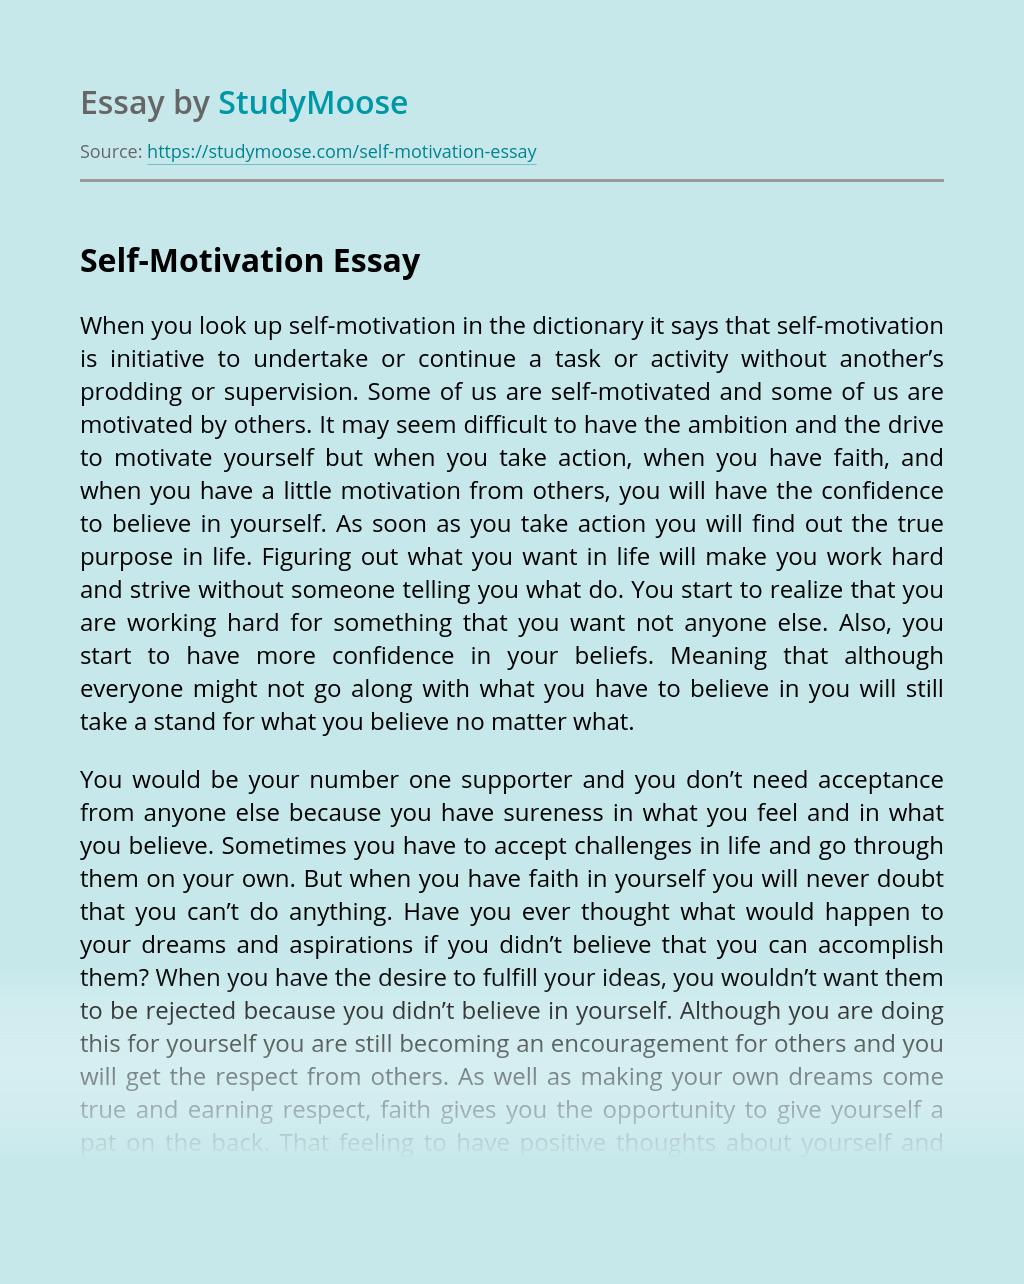 Self-Motivation Free Essay Example